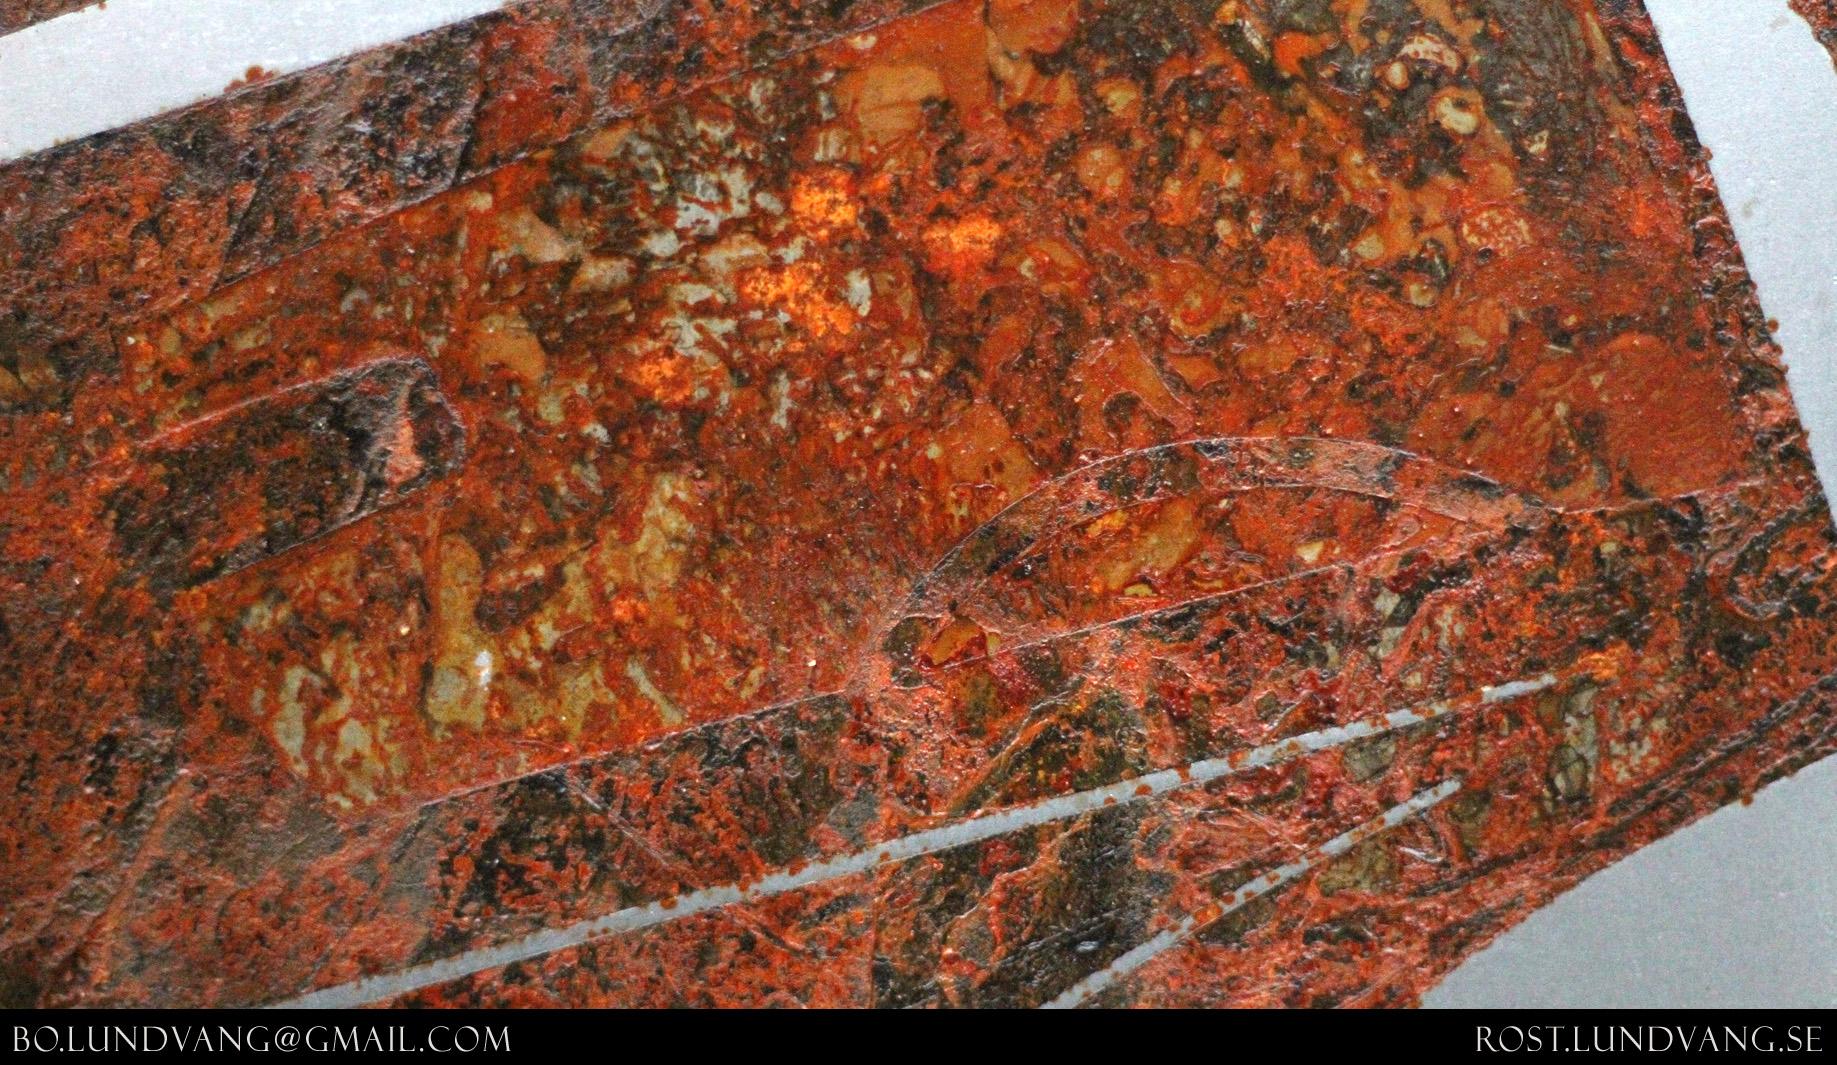 Rost Lundvang Se Rust Art